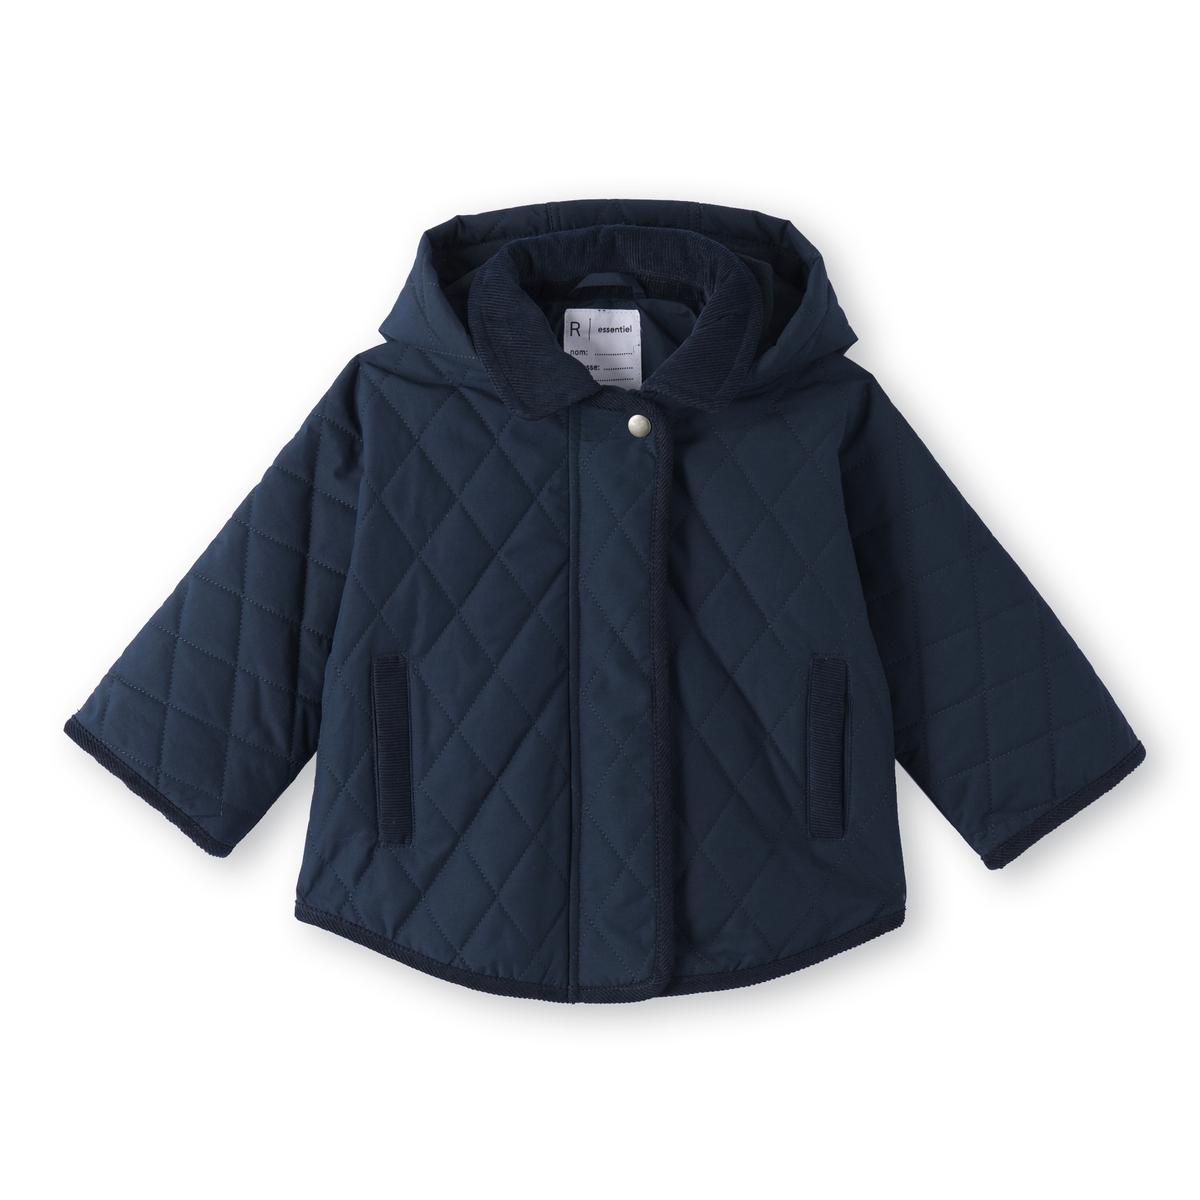 Пальто-кейп с капюшоном 3-12 ans